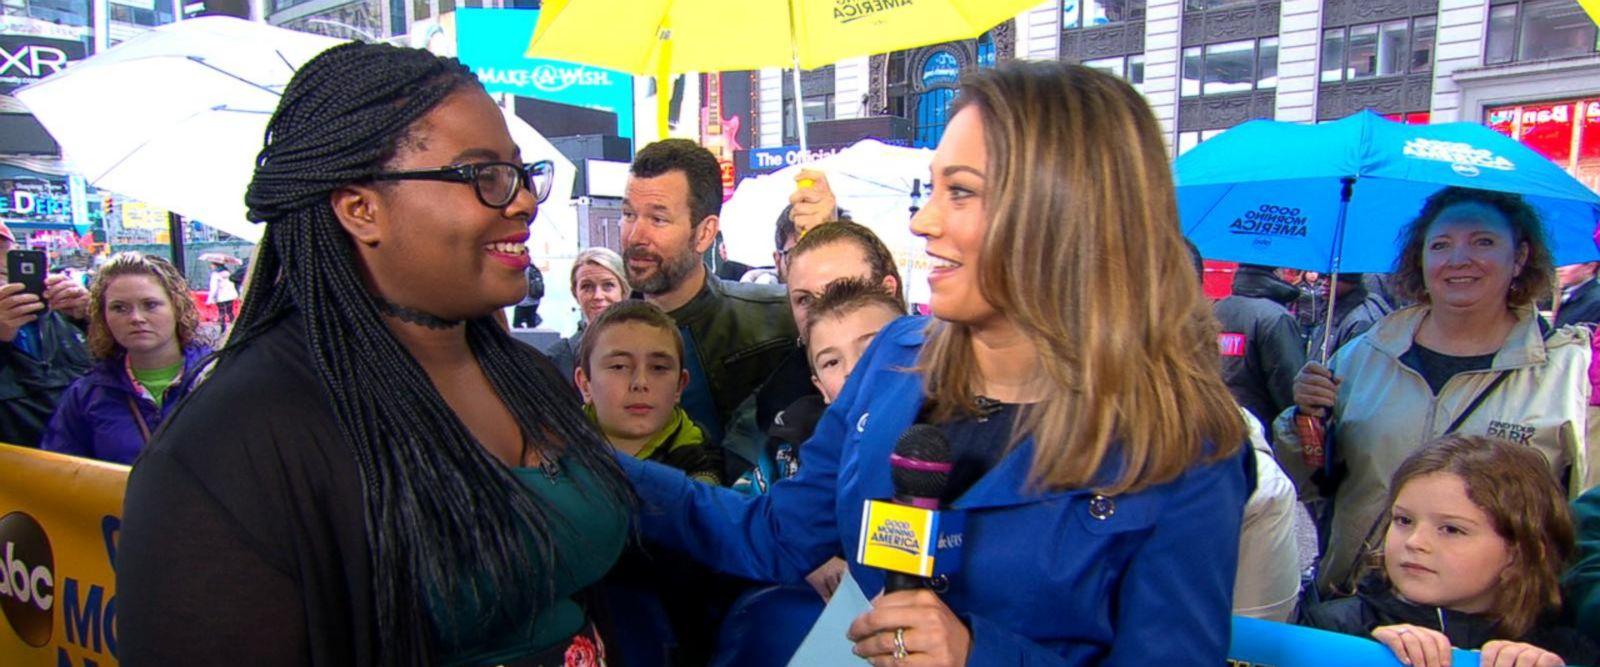 VIDEO: Environmental activist Destiny Watford appears live on 'GMA'